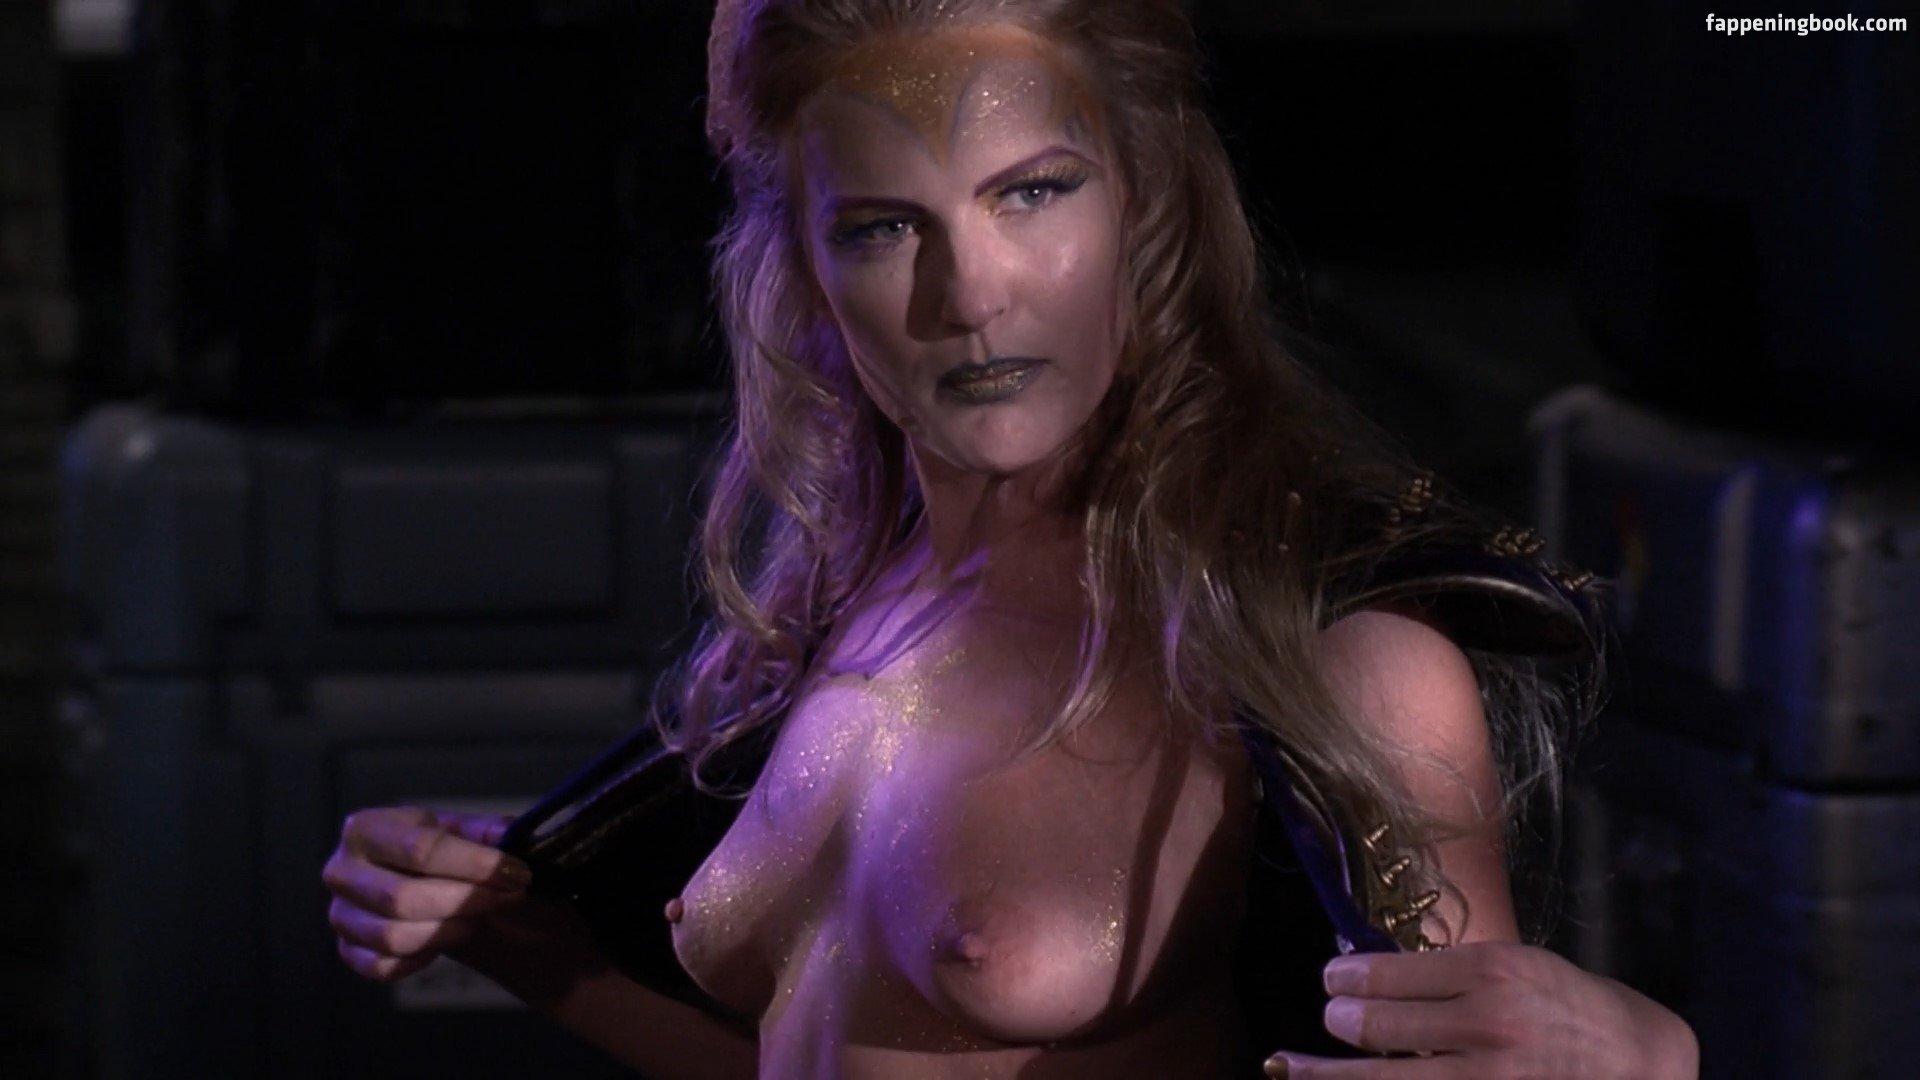 nackt Carlton Rebekah Profile of